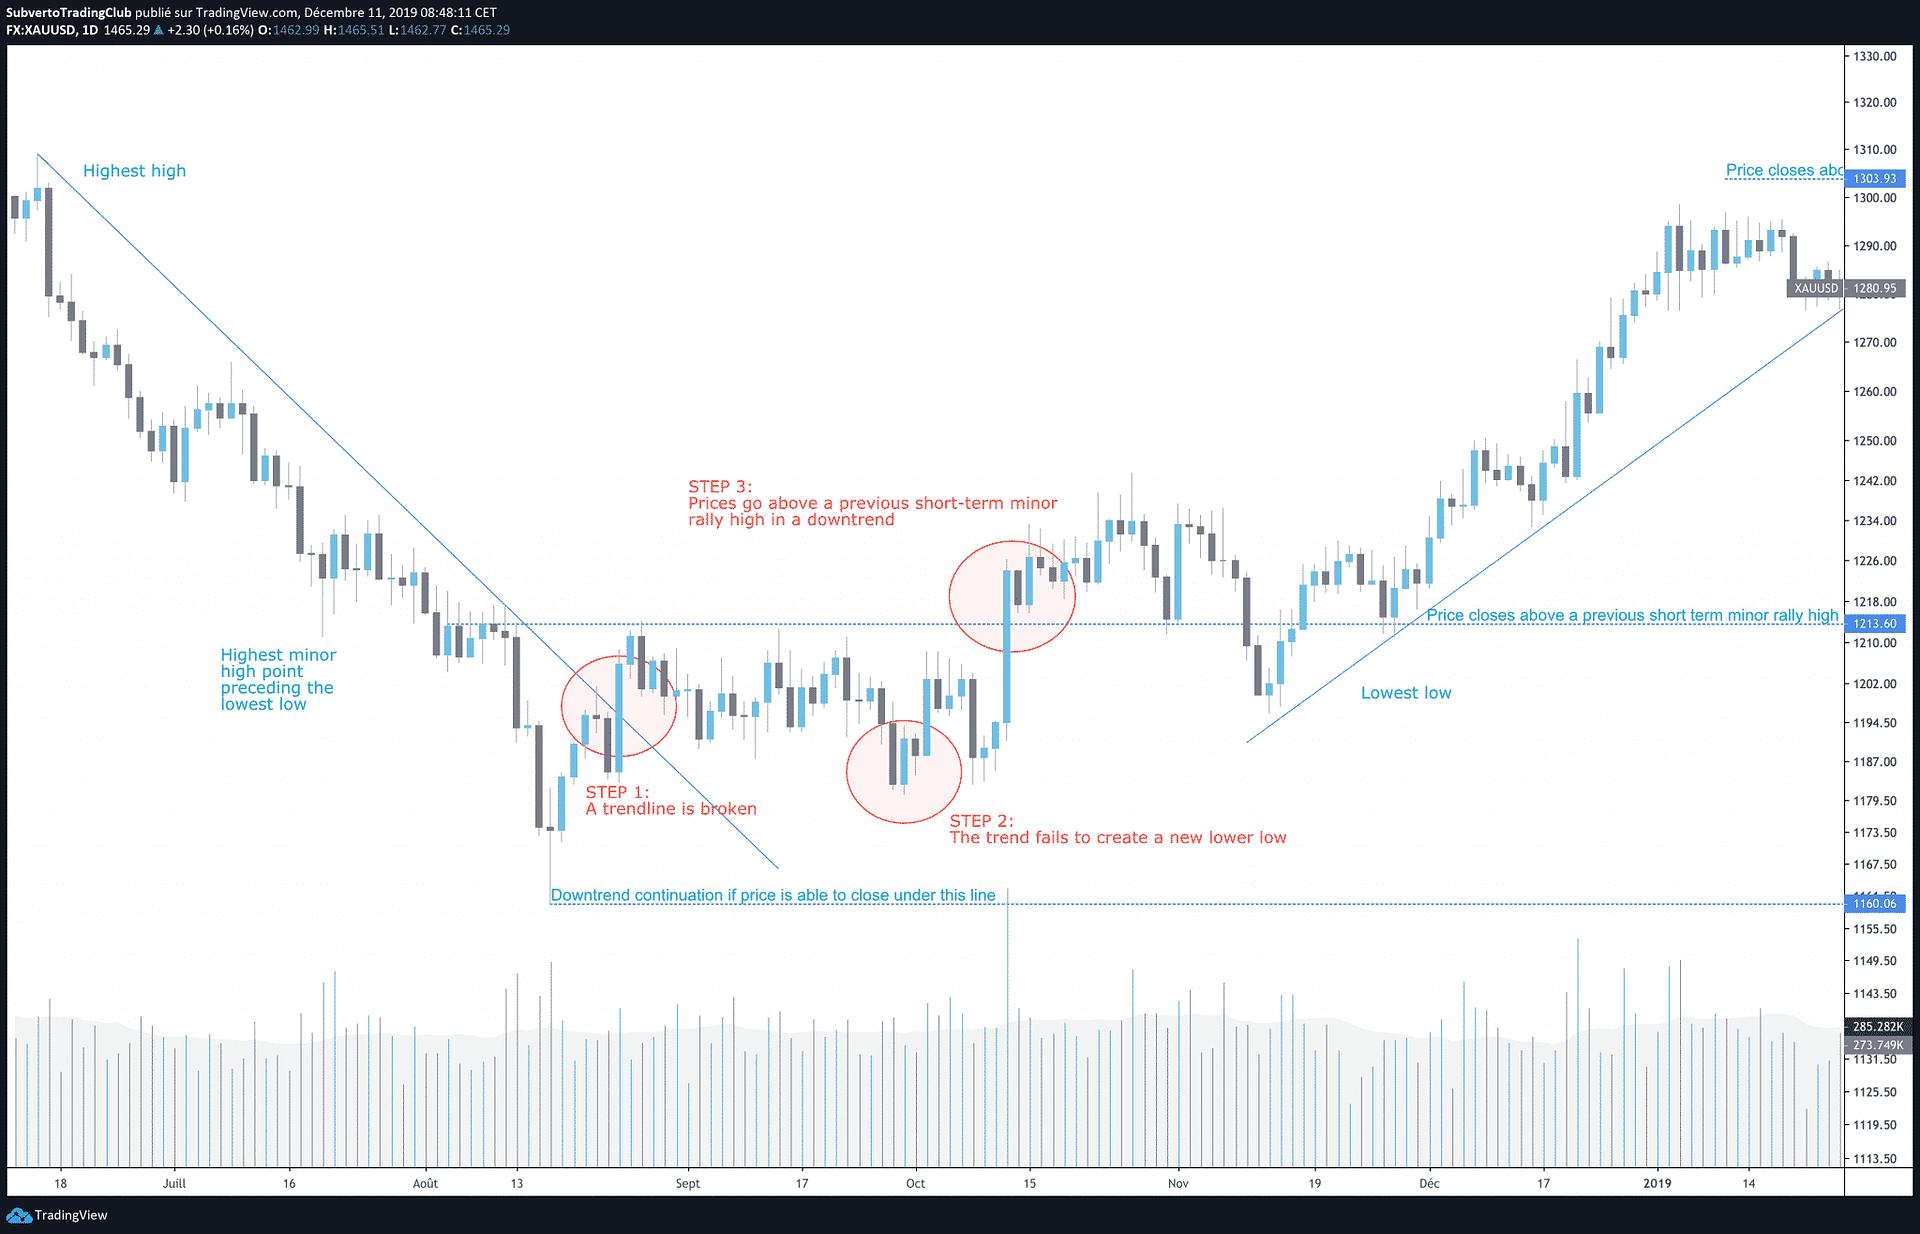 Vic SPERANDEO downtrend trend reversal step by step 1 2 3